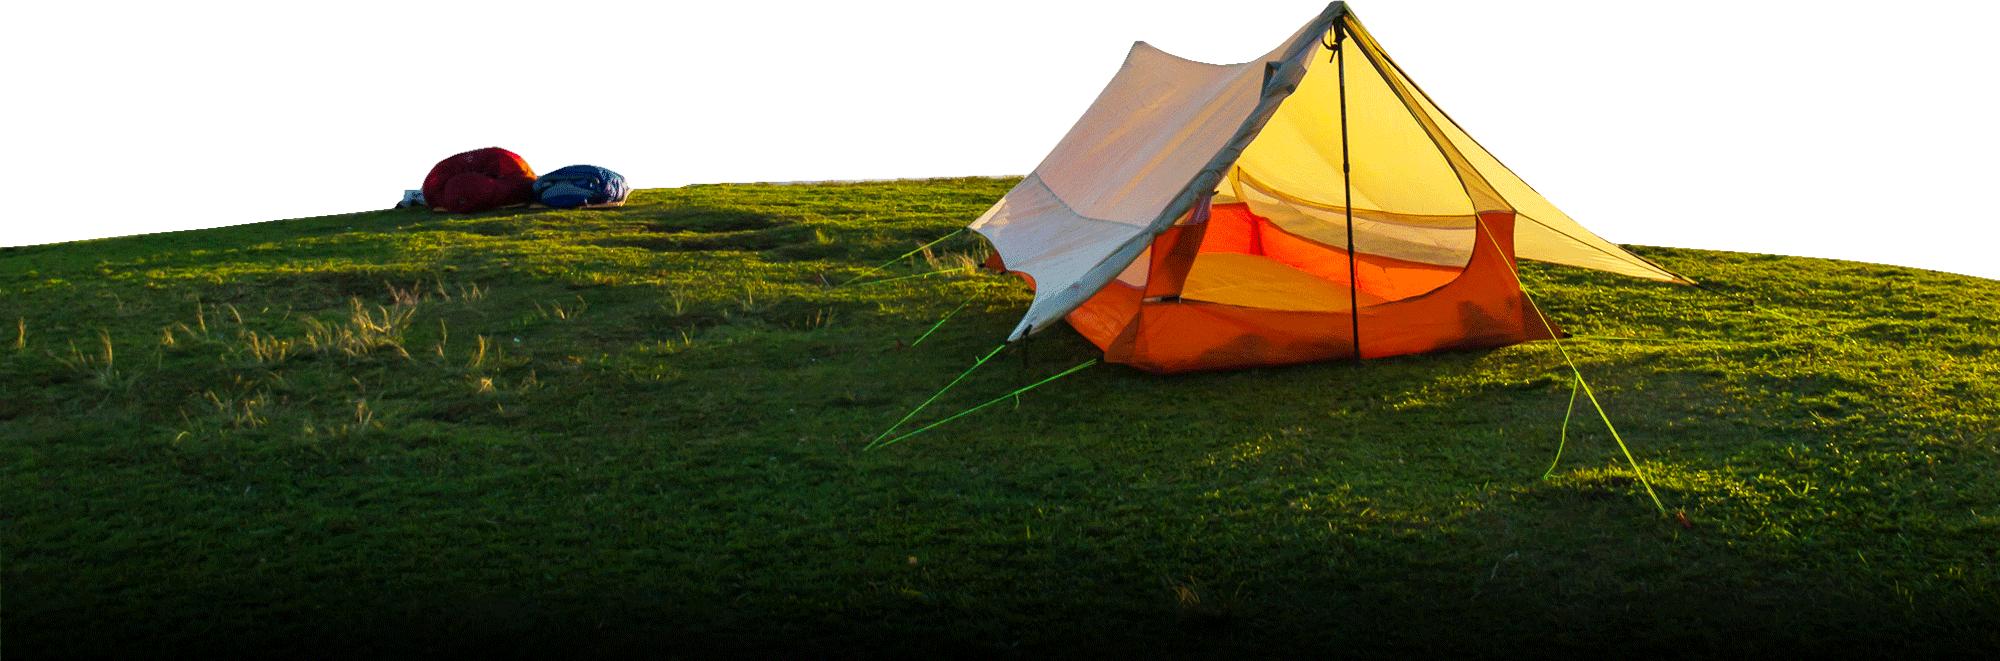 campingshop.ch Tent